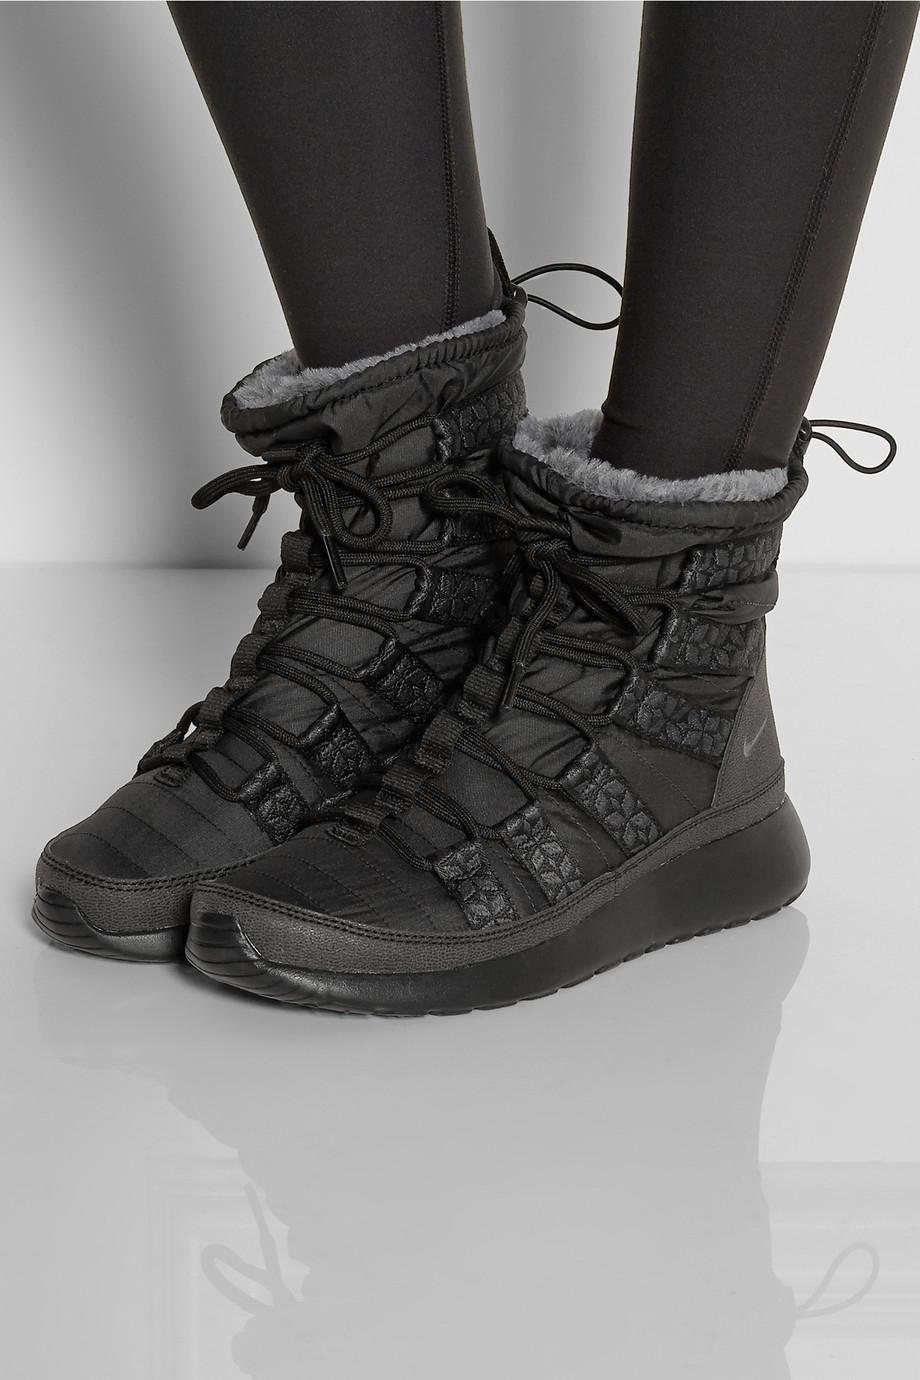 Nike Roshe Run Hi Shell Sneaker Style Boots In Black Lyst